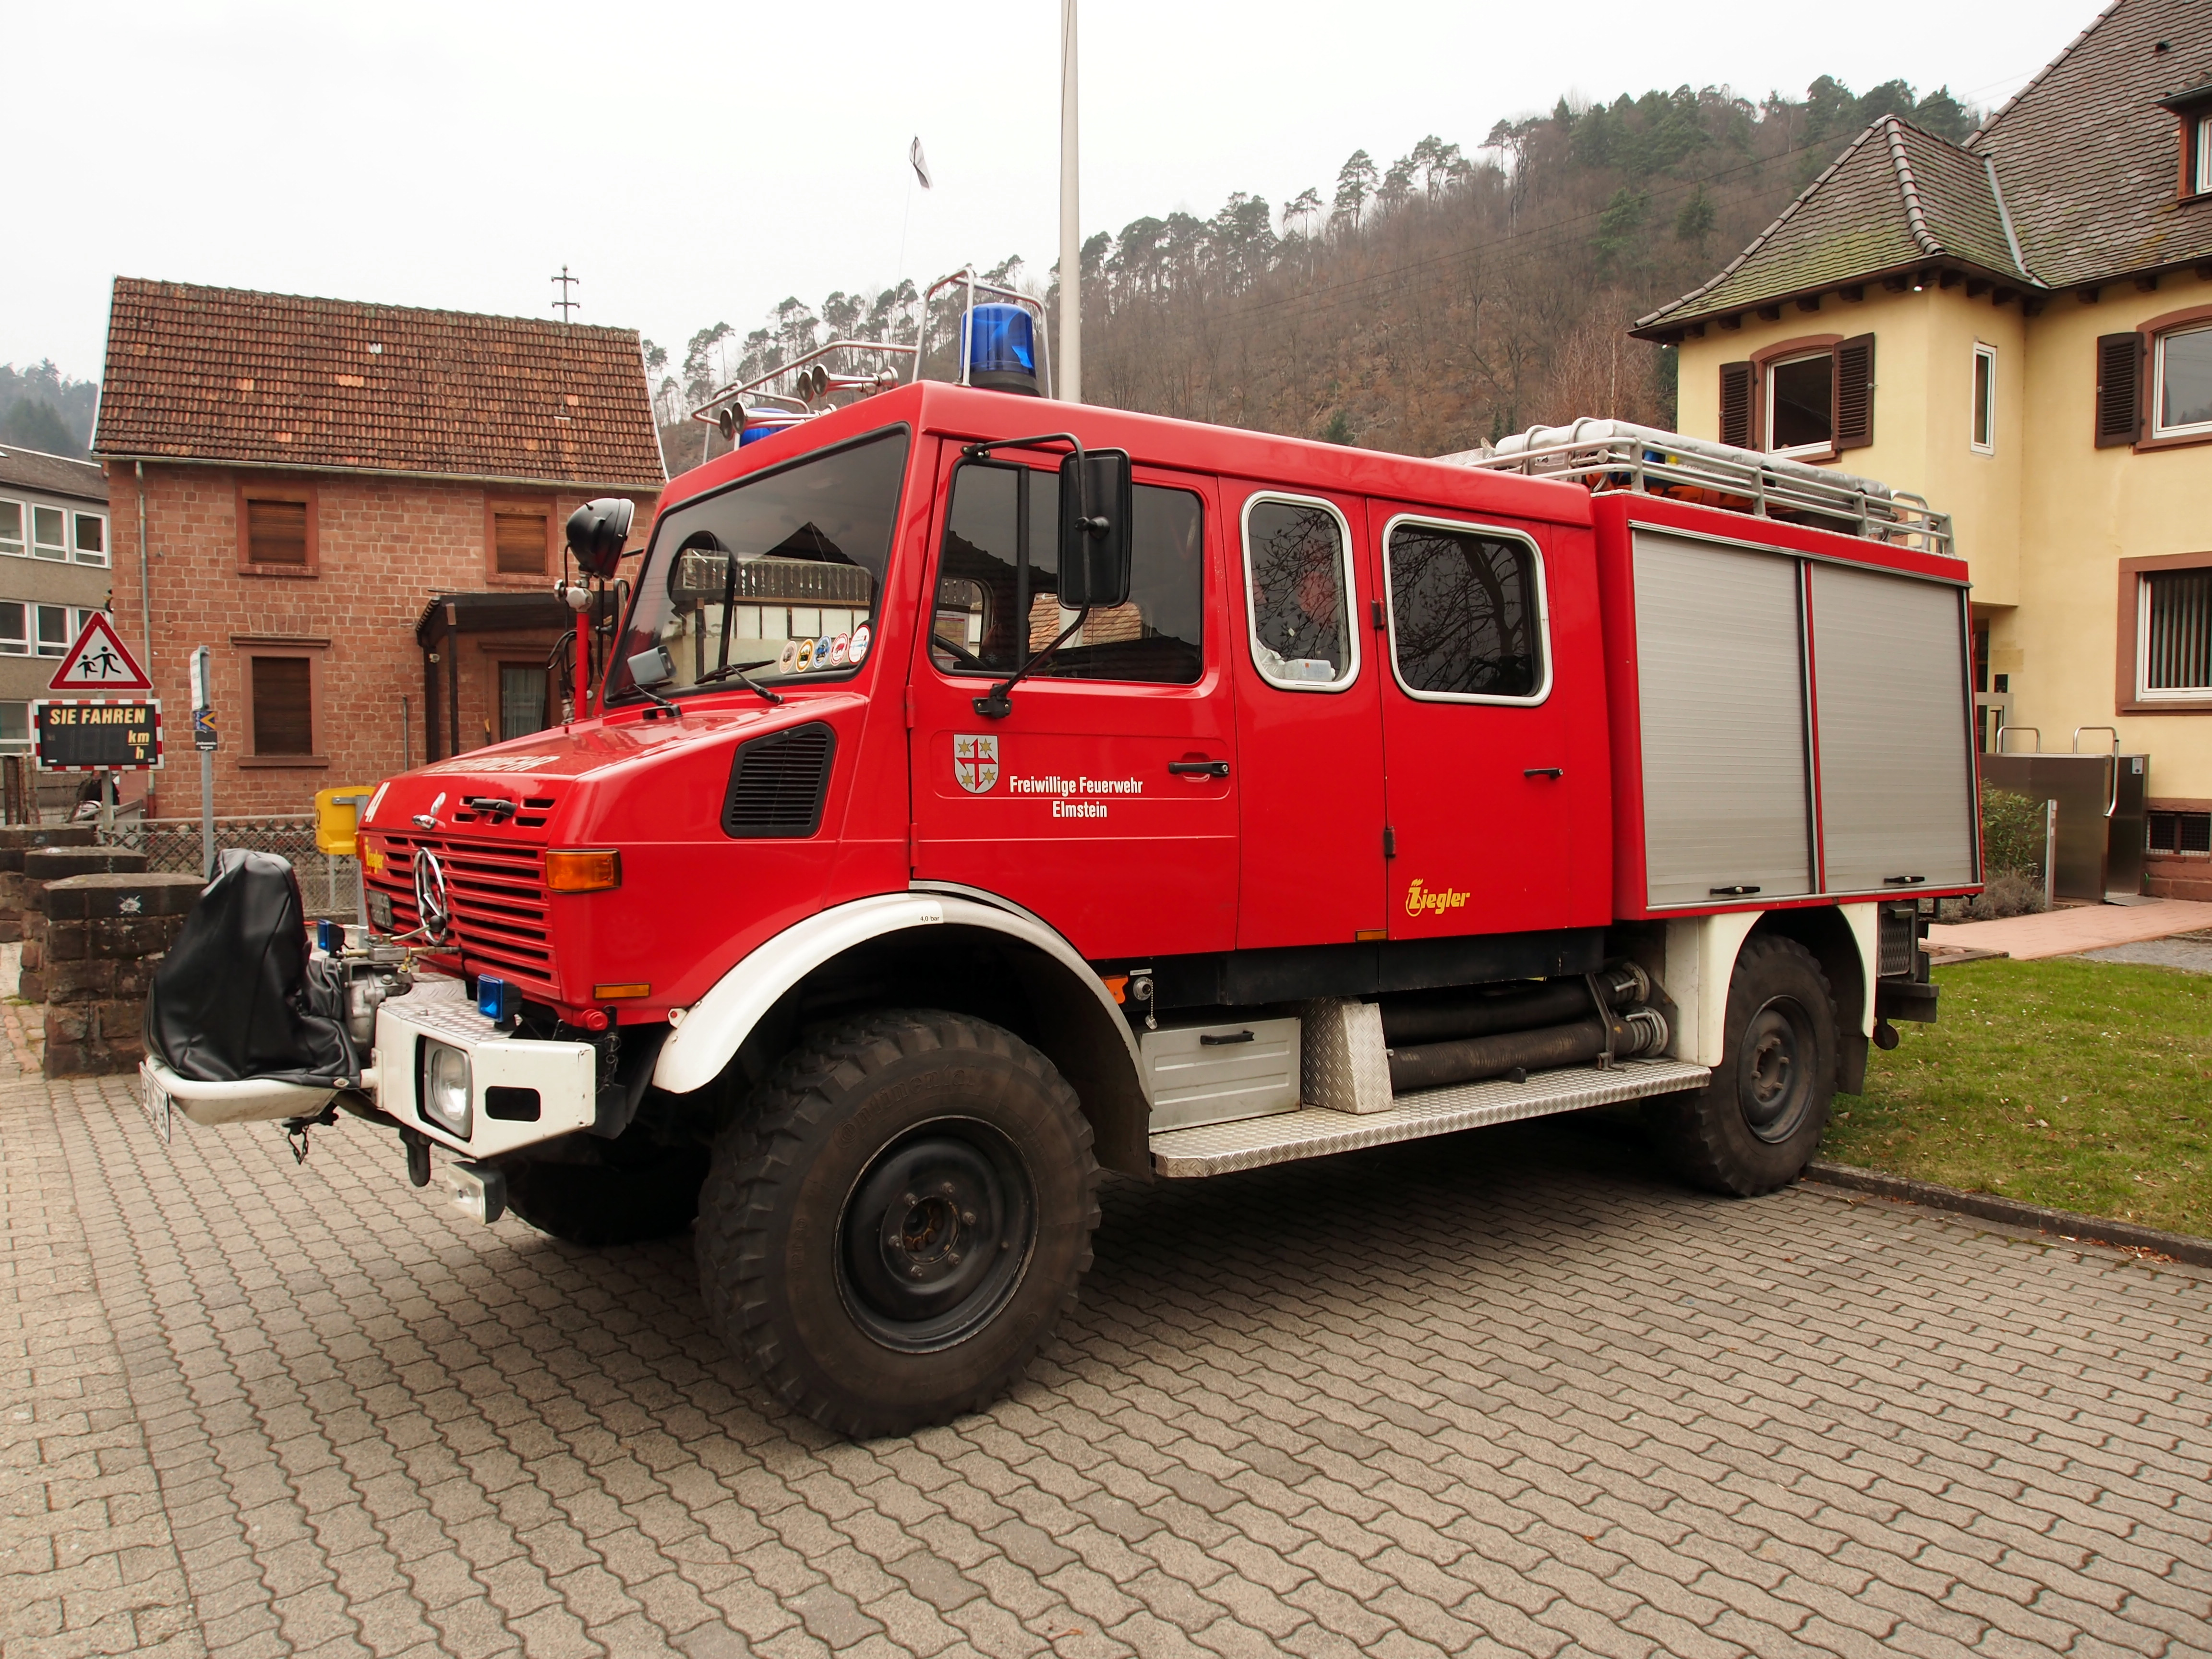 Mercedes Benz Van >> File:Mercedes Benz Unimog 1300L, Unit 41 of the Freiwillige Feuerwehr Elmstein pic2.JPG ...